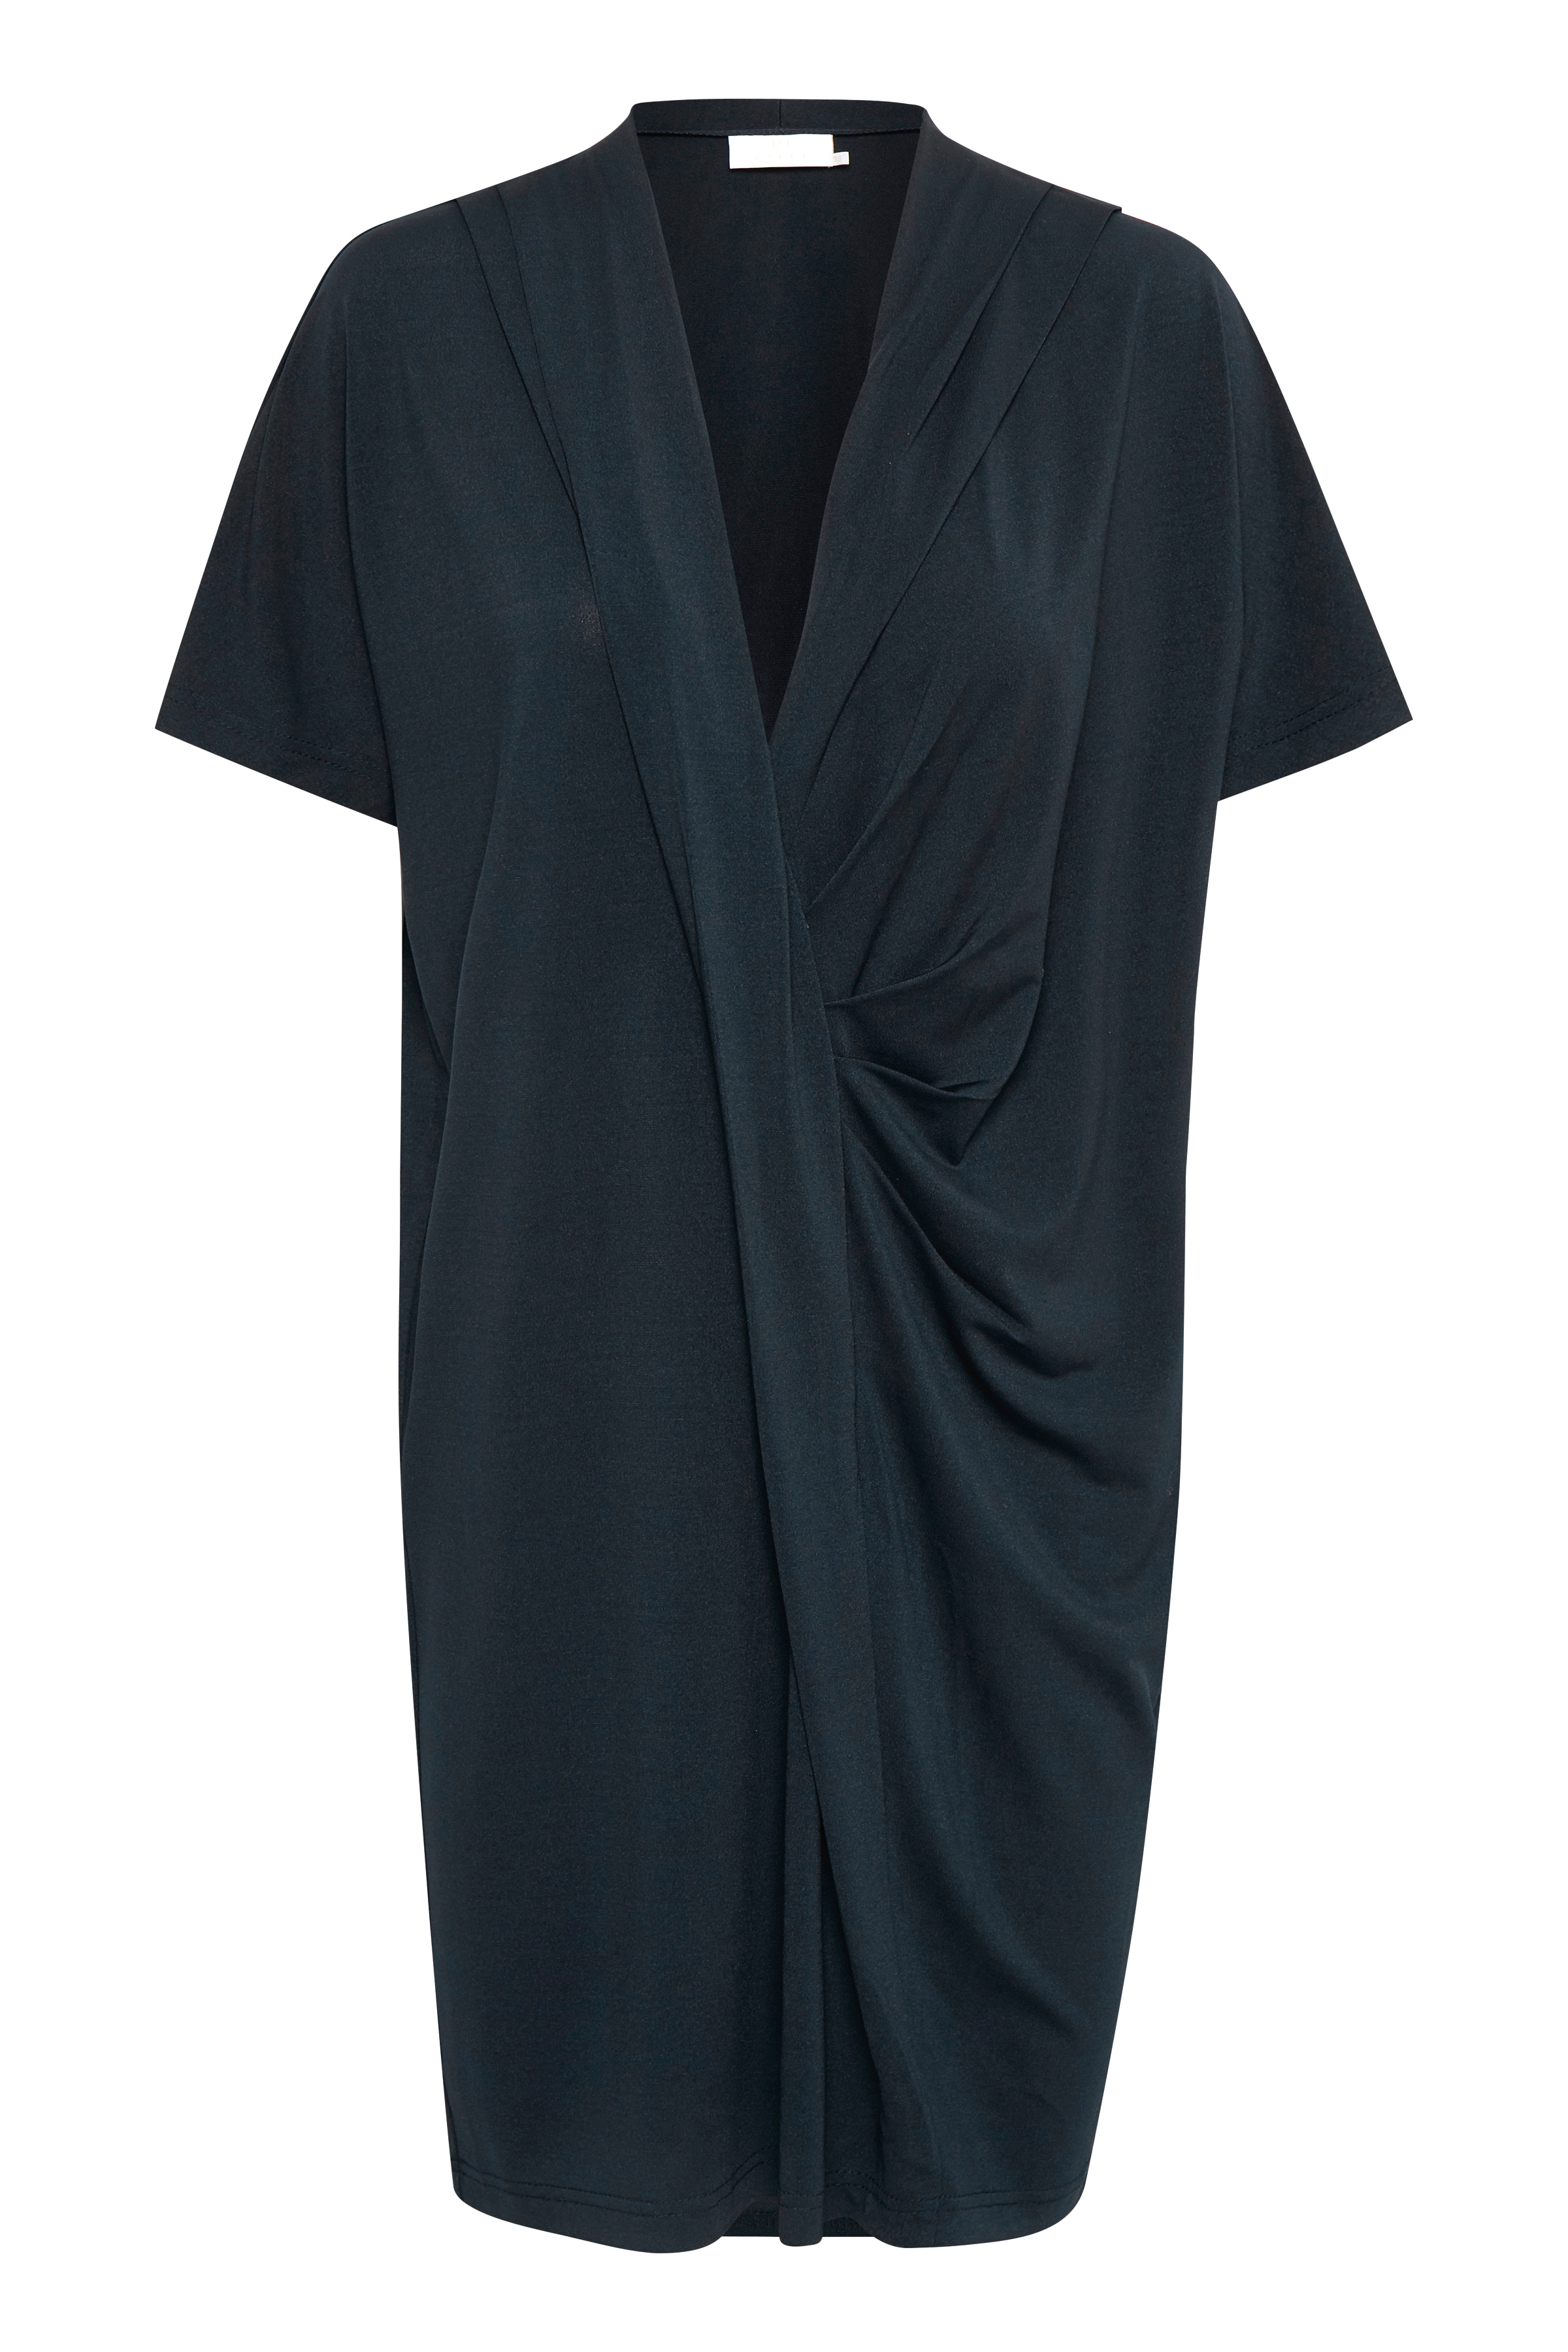 Kaffe Dame Kortærmet kjole - Marineblå